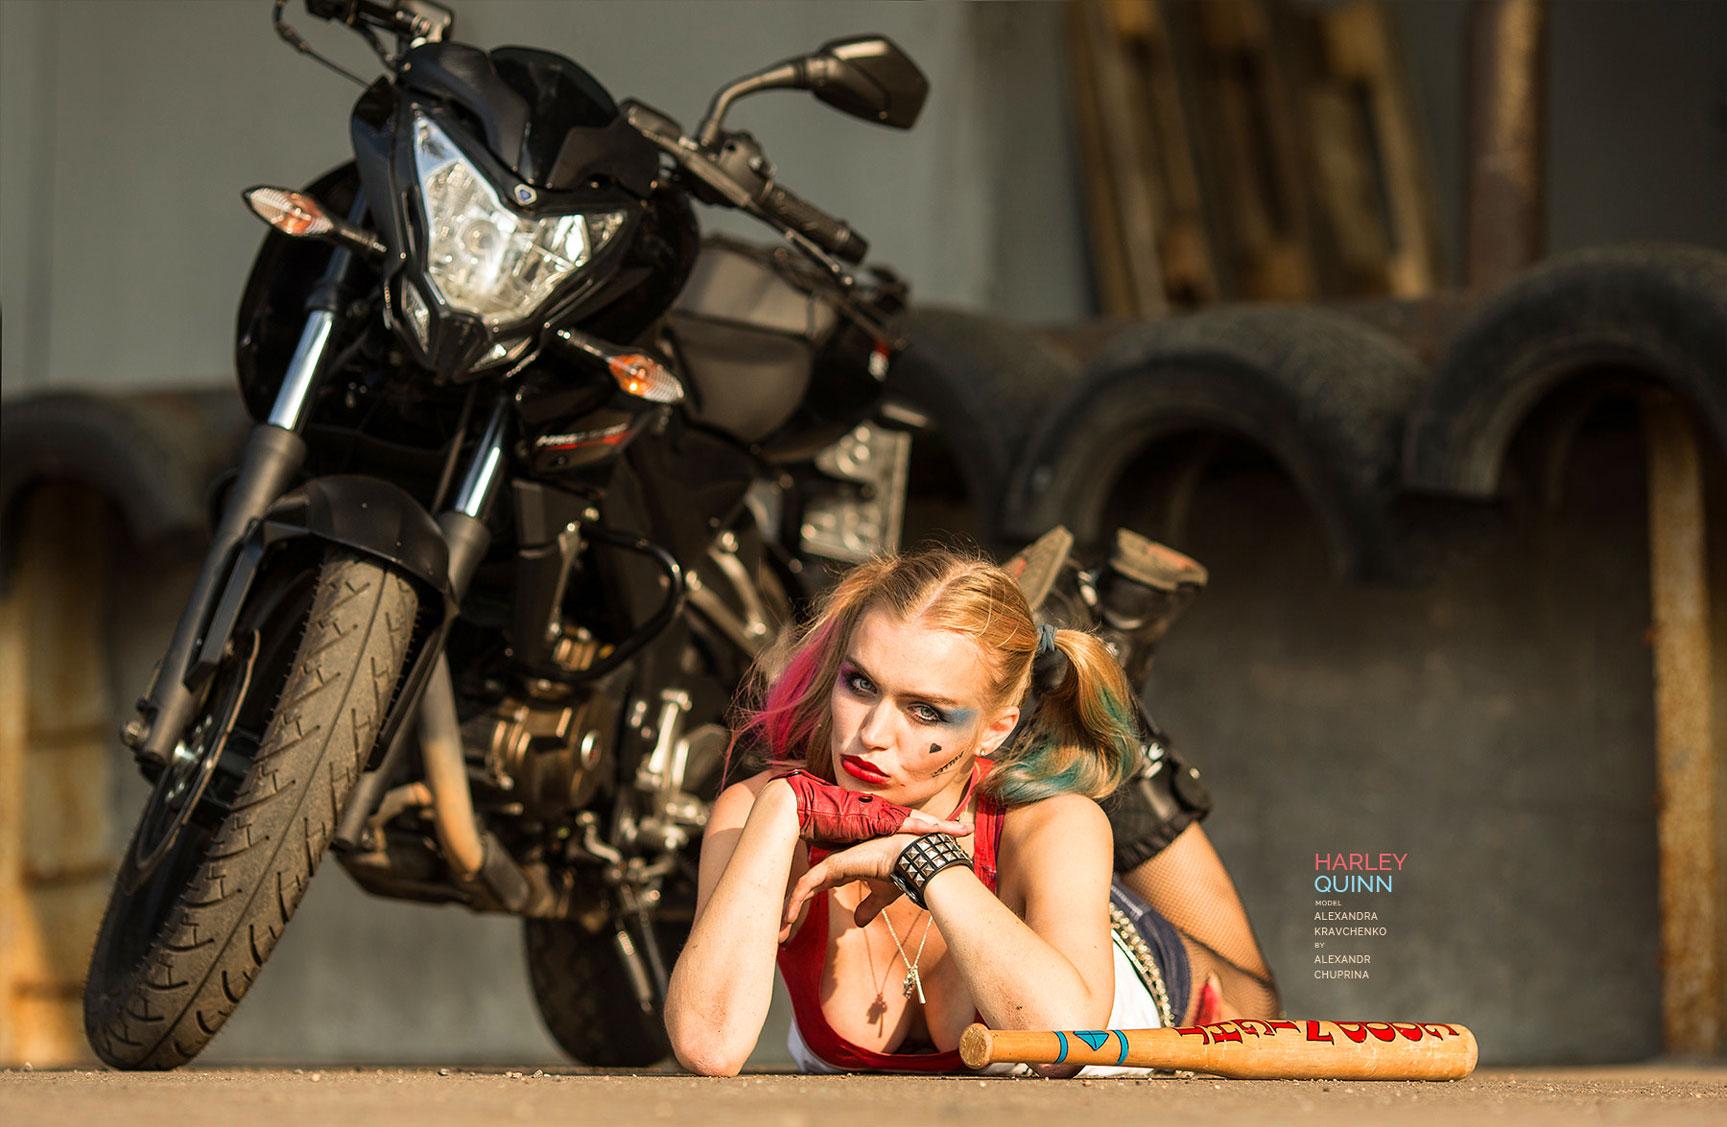 Harley Quinn - Александра Кравченко / Alexandra Kravchenko by Alexandr Chuprina